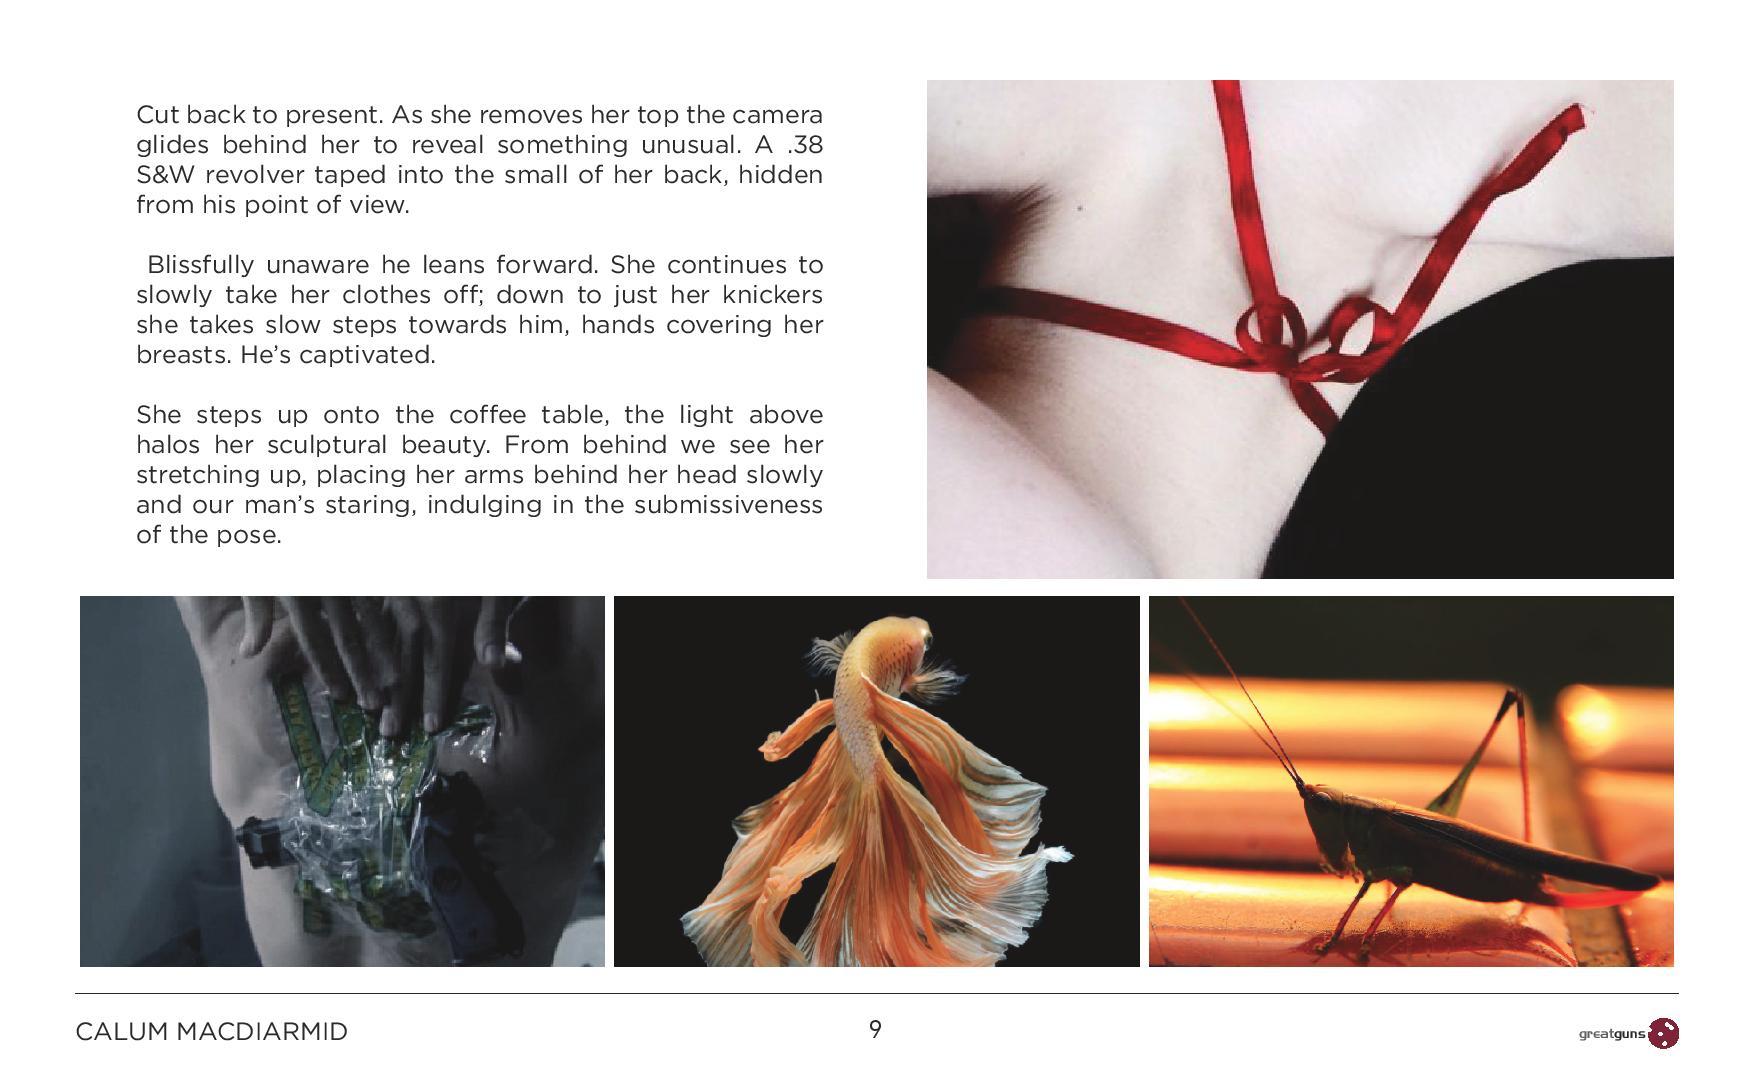 Sirens-page-009.jpg